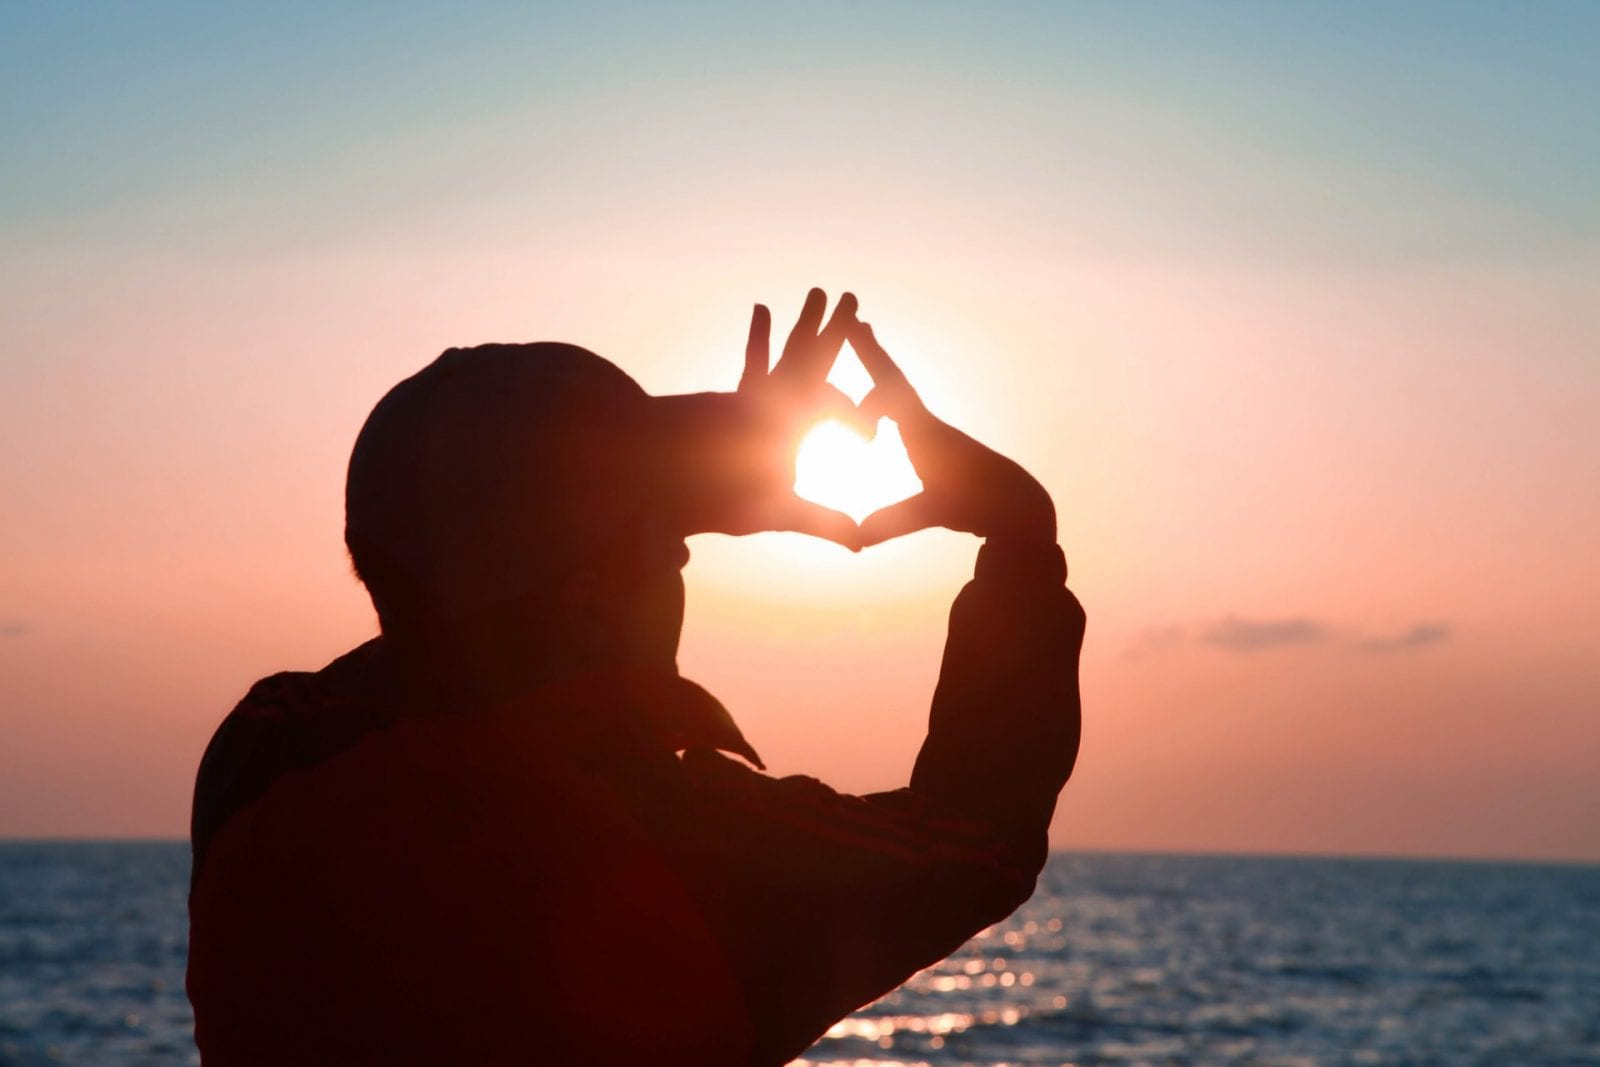 Sun gazing benefits